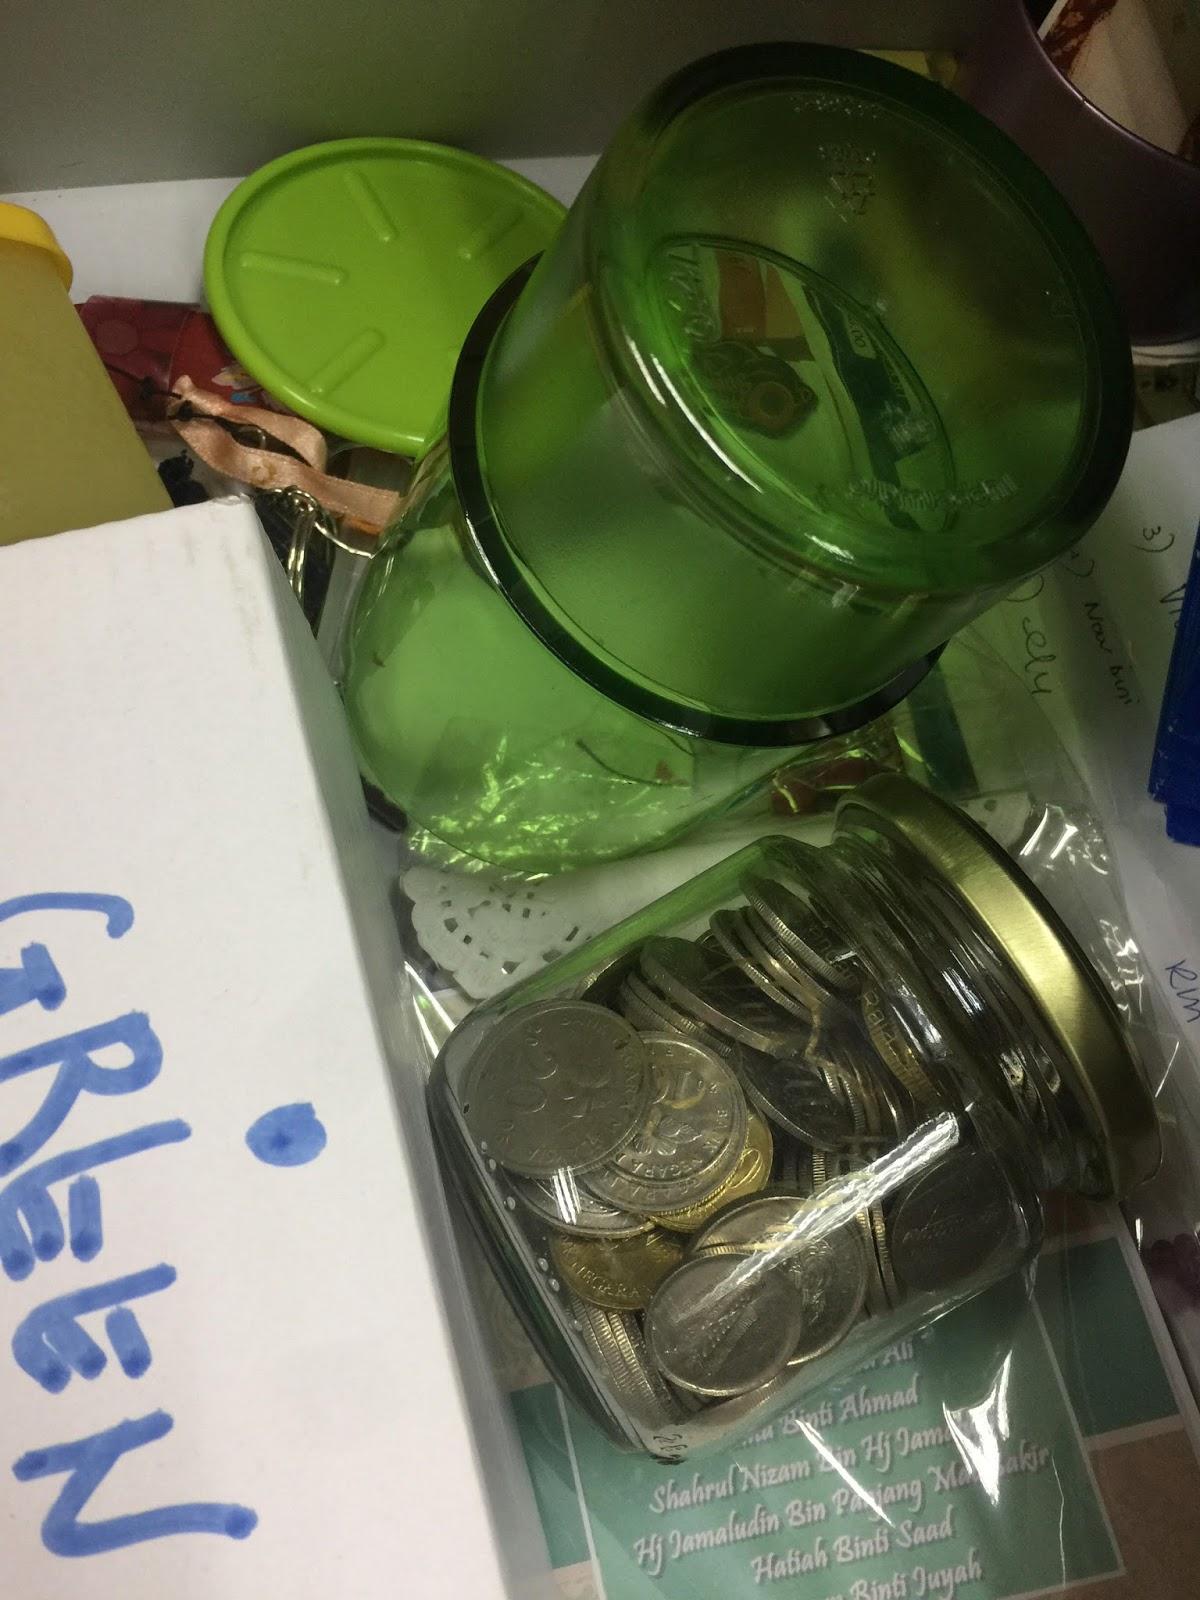 tabungan harian, tabungan syiling, menyimpan wang, tabungan hijau